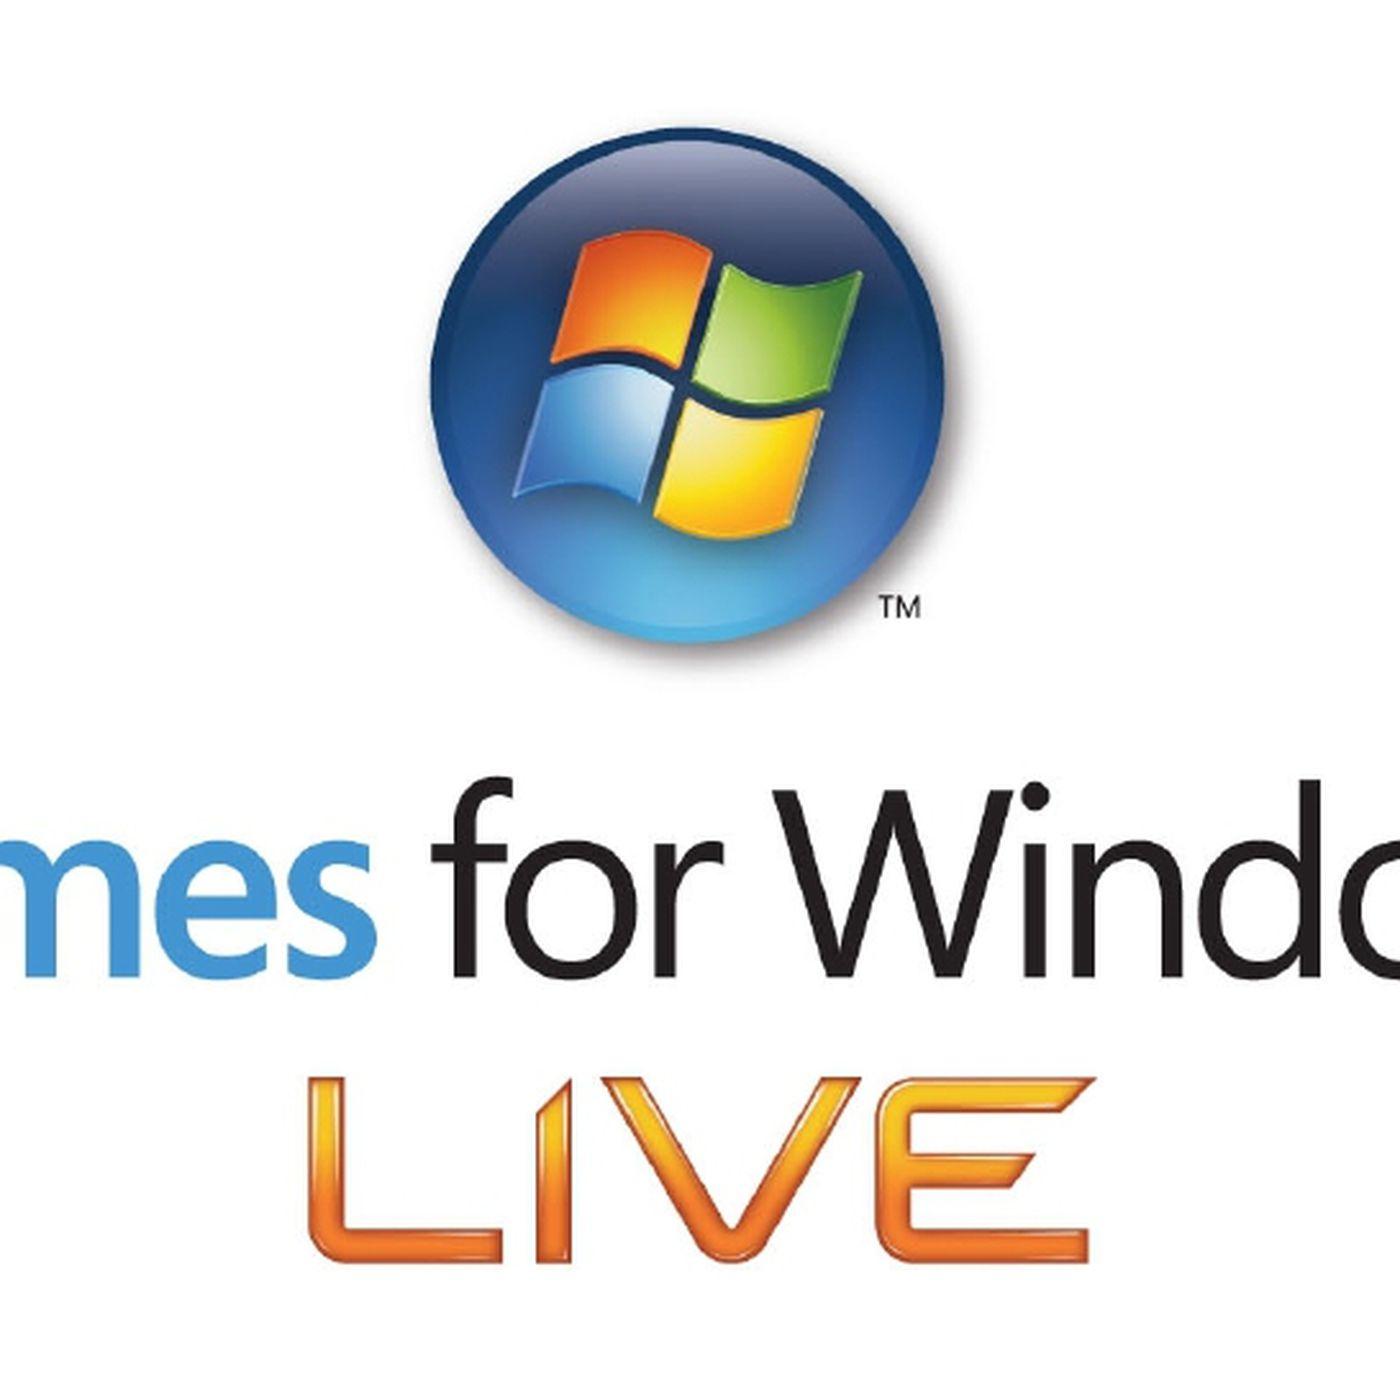 Microsoft says it isn't shutting down Games for Windows Live - Polygon